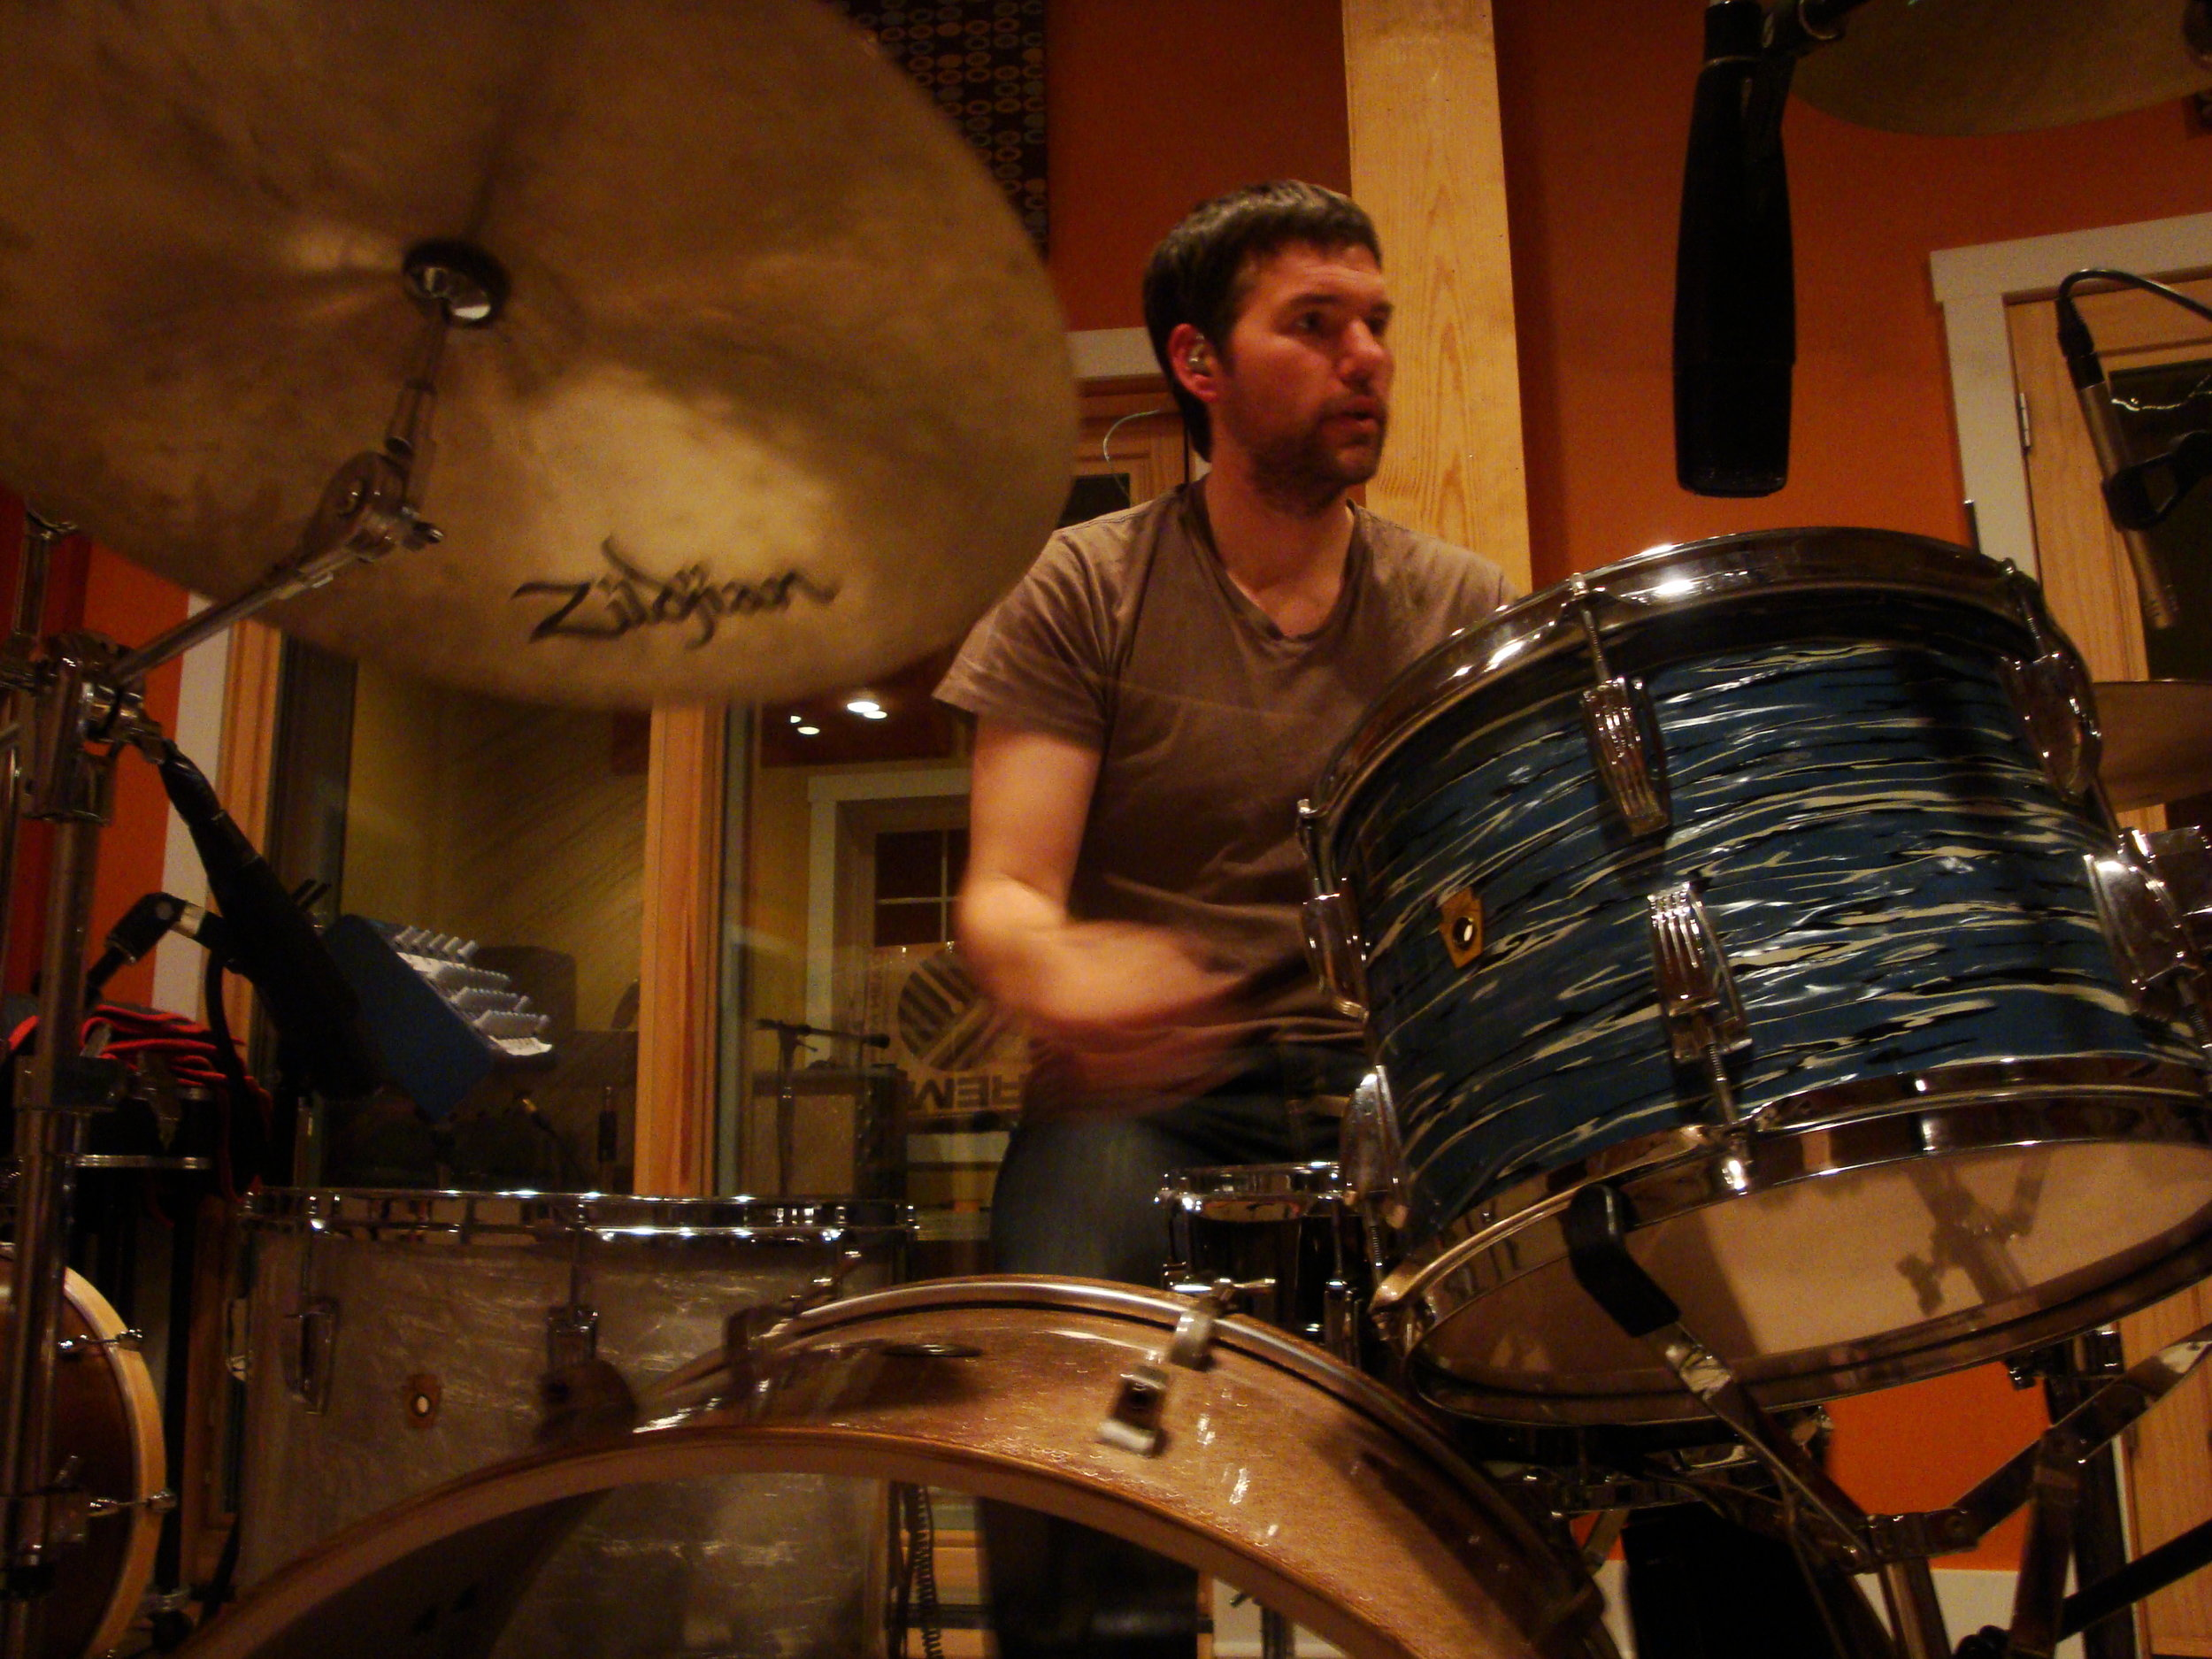 hunter drums2.jpg